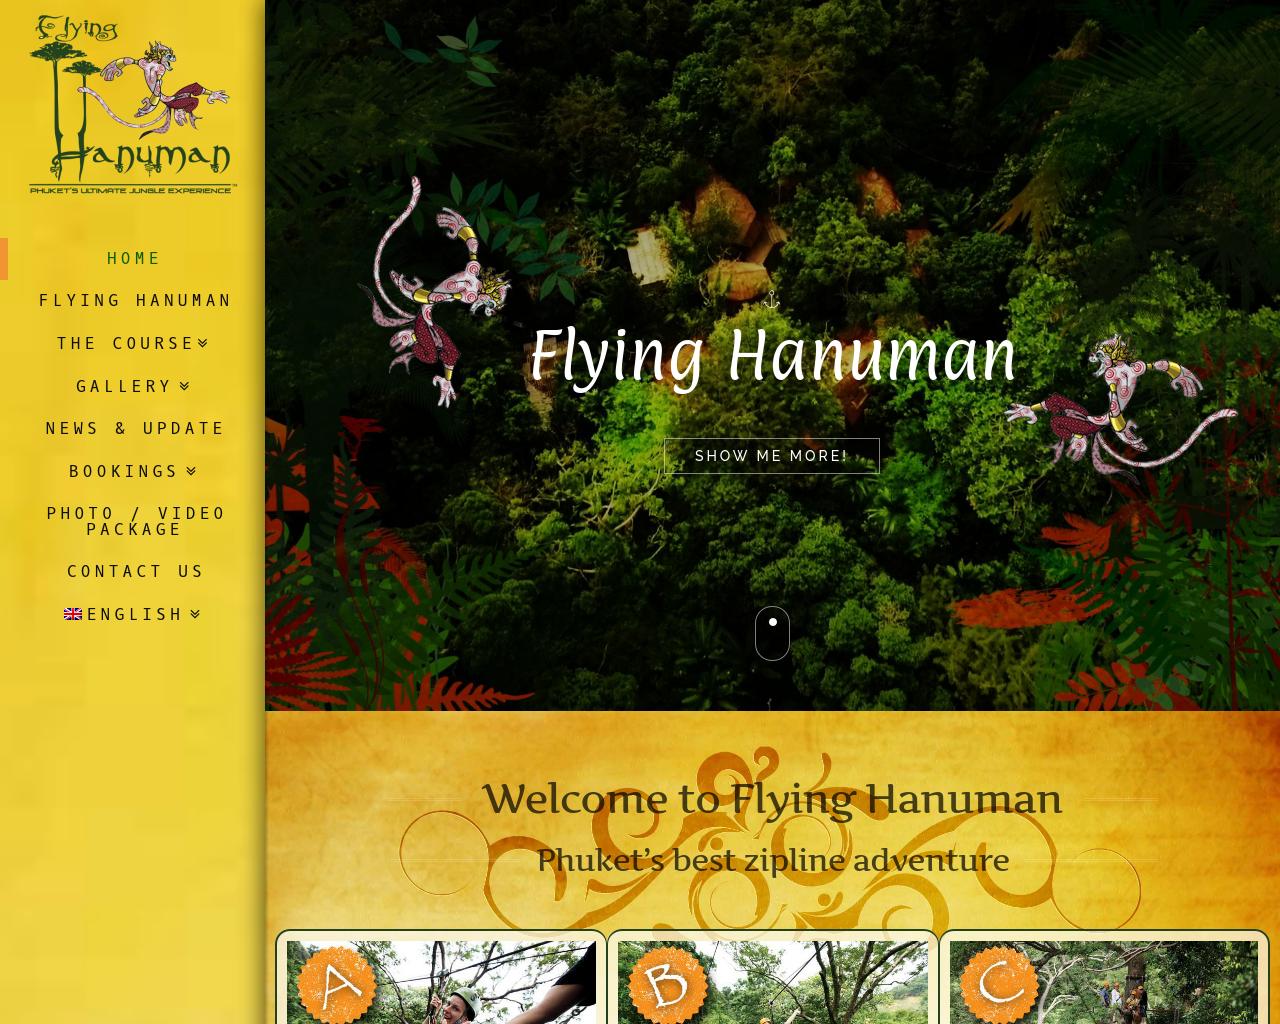 Flying-Hanuman-Advertising-Reviews-Pricing